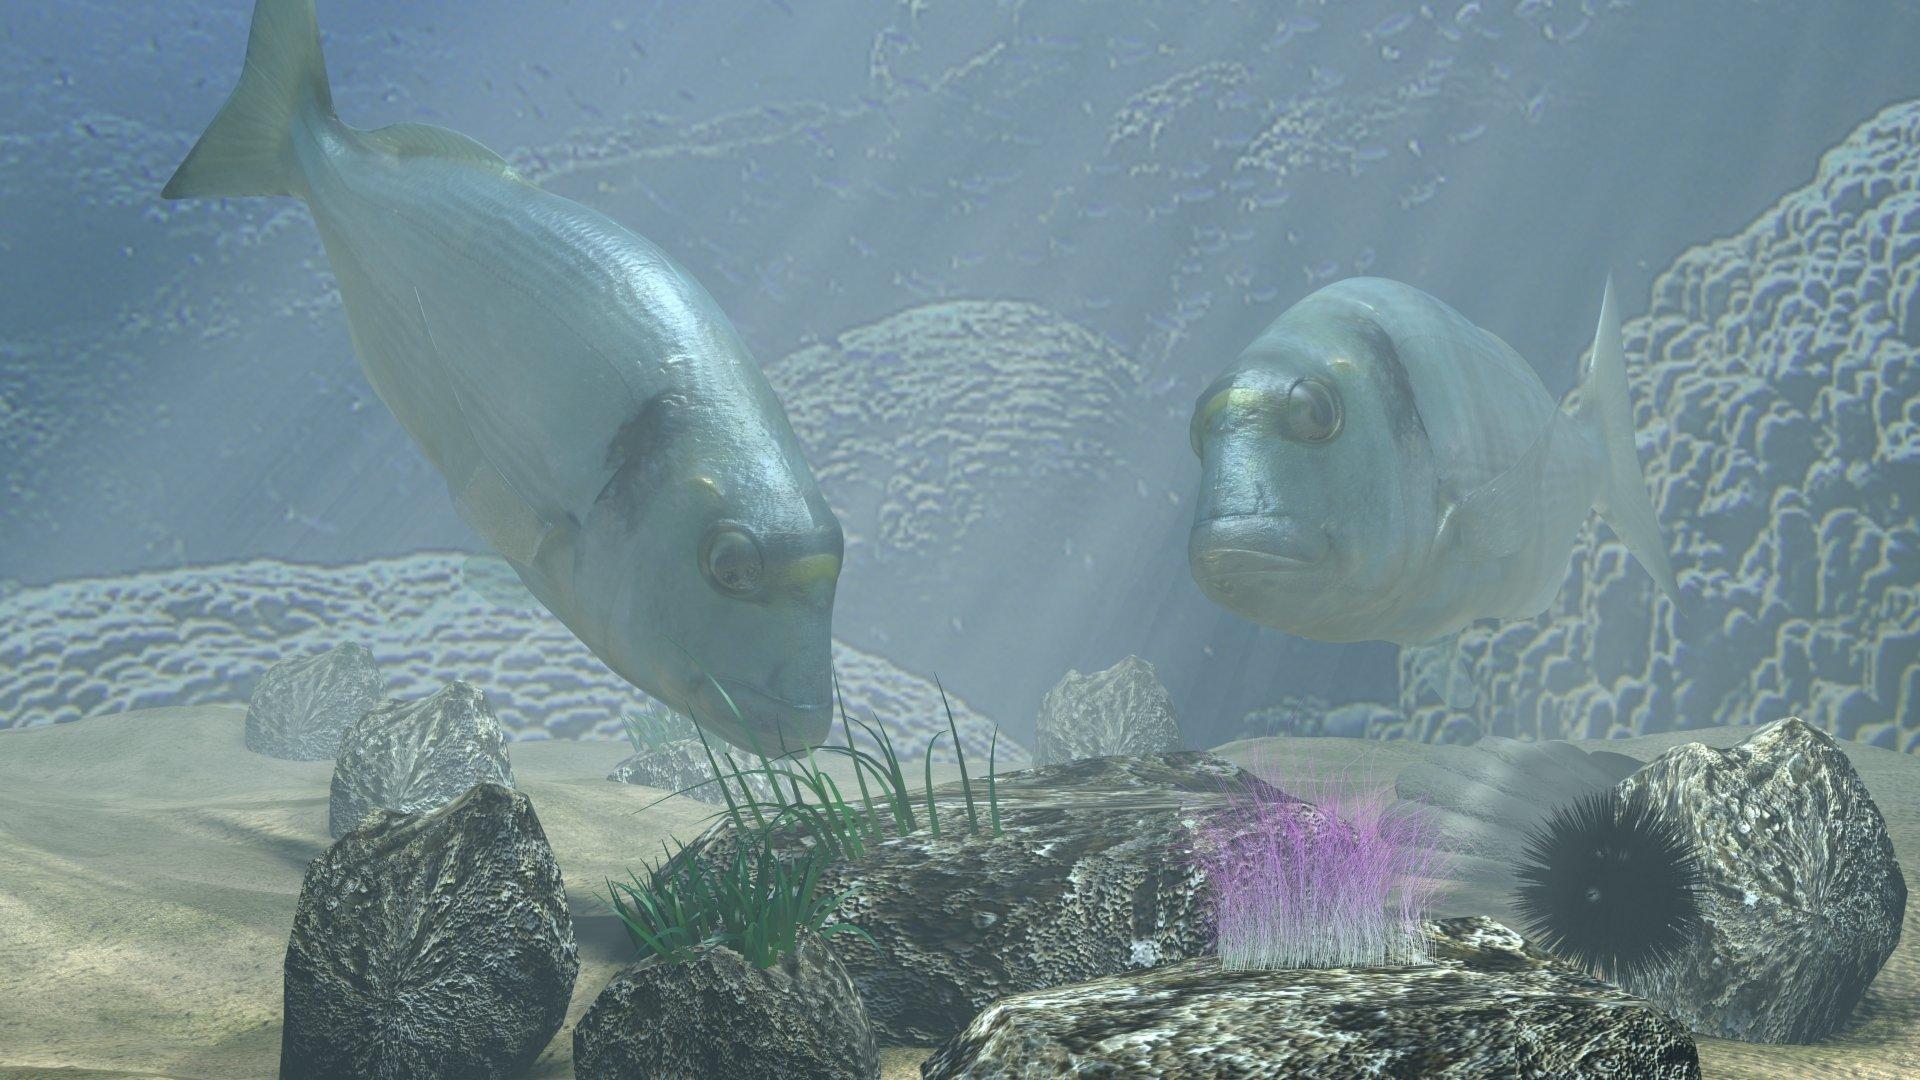 Animal - Fish  Sea Bream 3D Dorade Daurade Mediterranean Underwater Shell Seaweed Ocean Floor Wallpaper